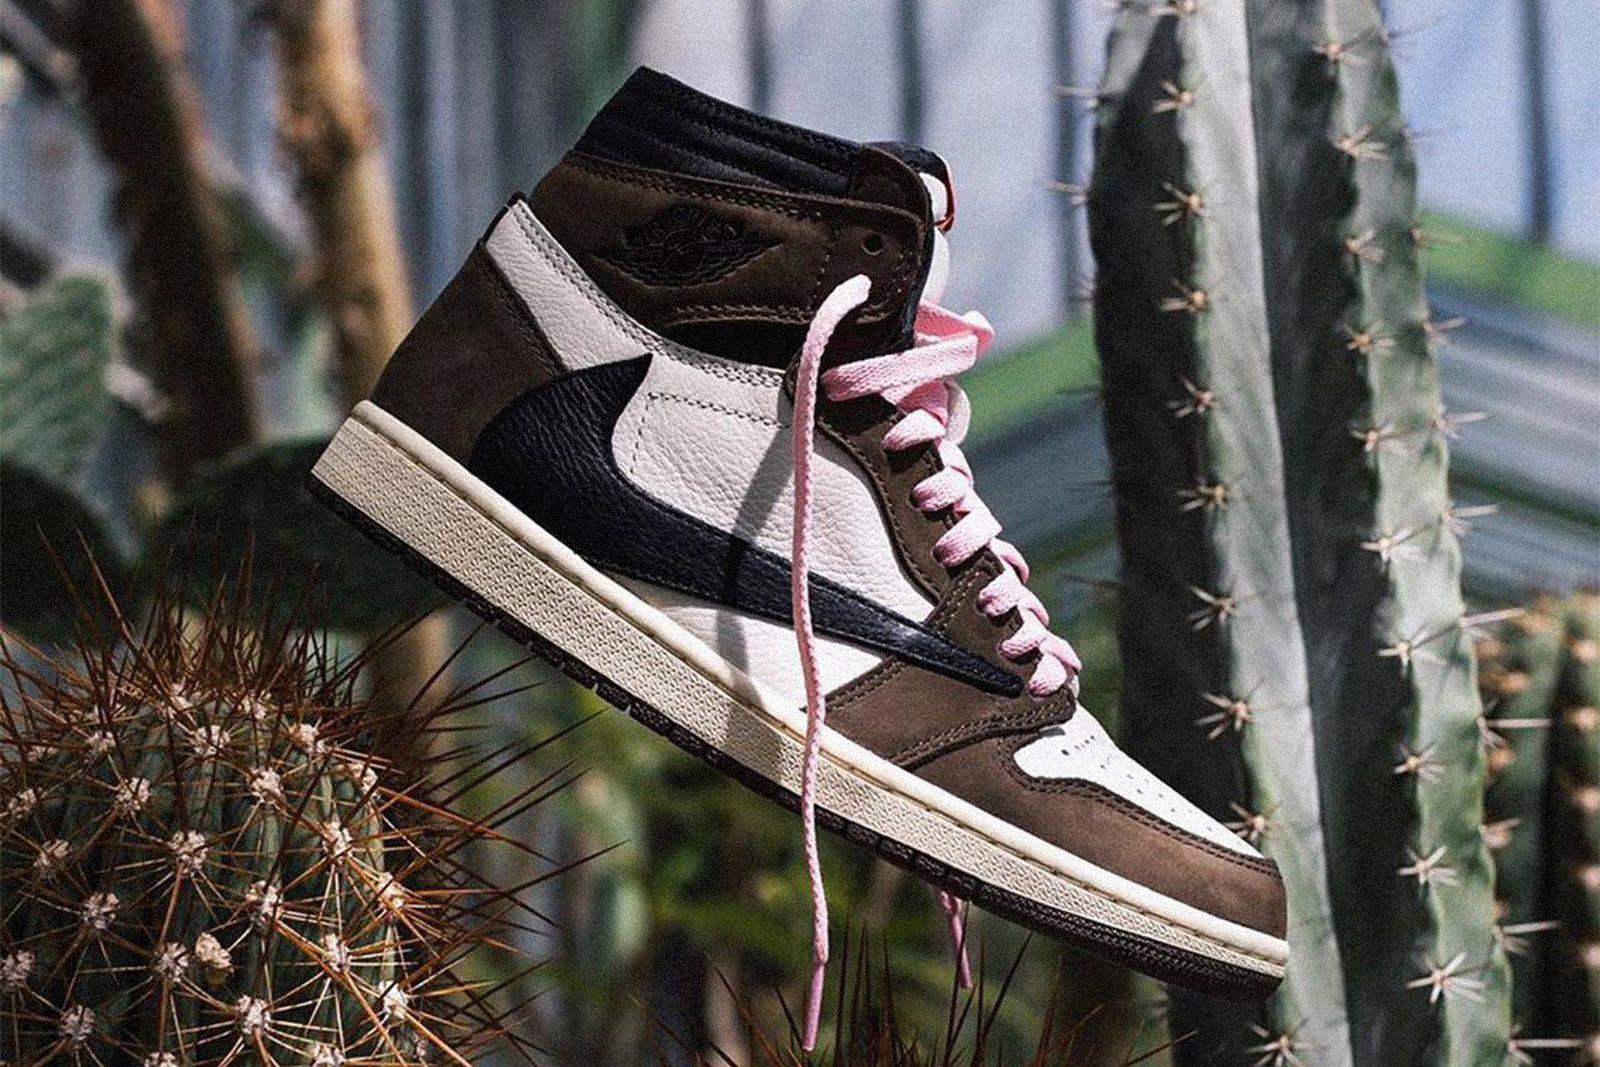 best sneakers 2019 october update1 Cactus Jack Nike Travis Scott